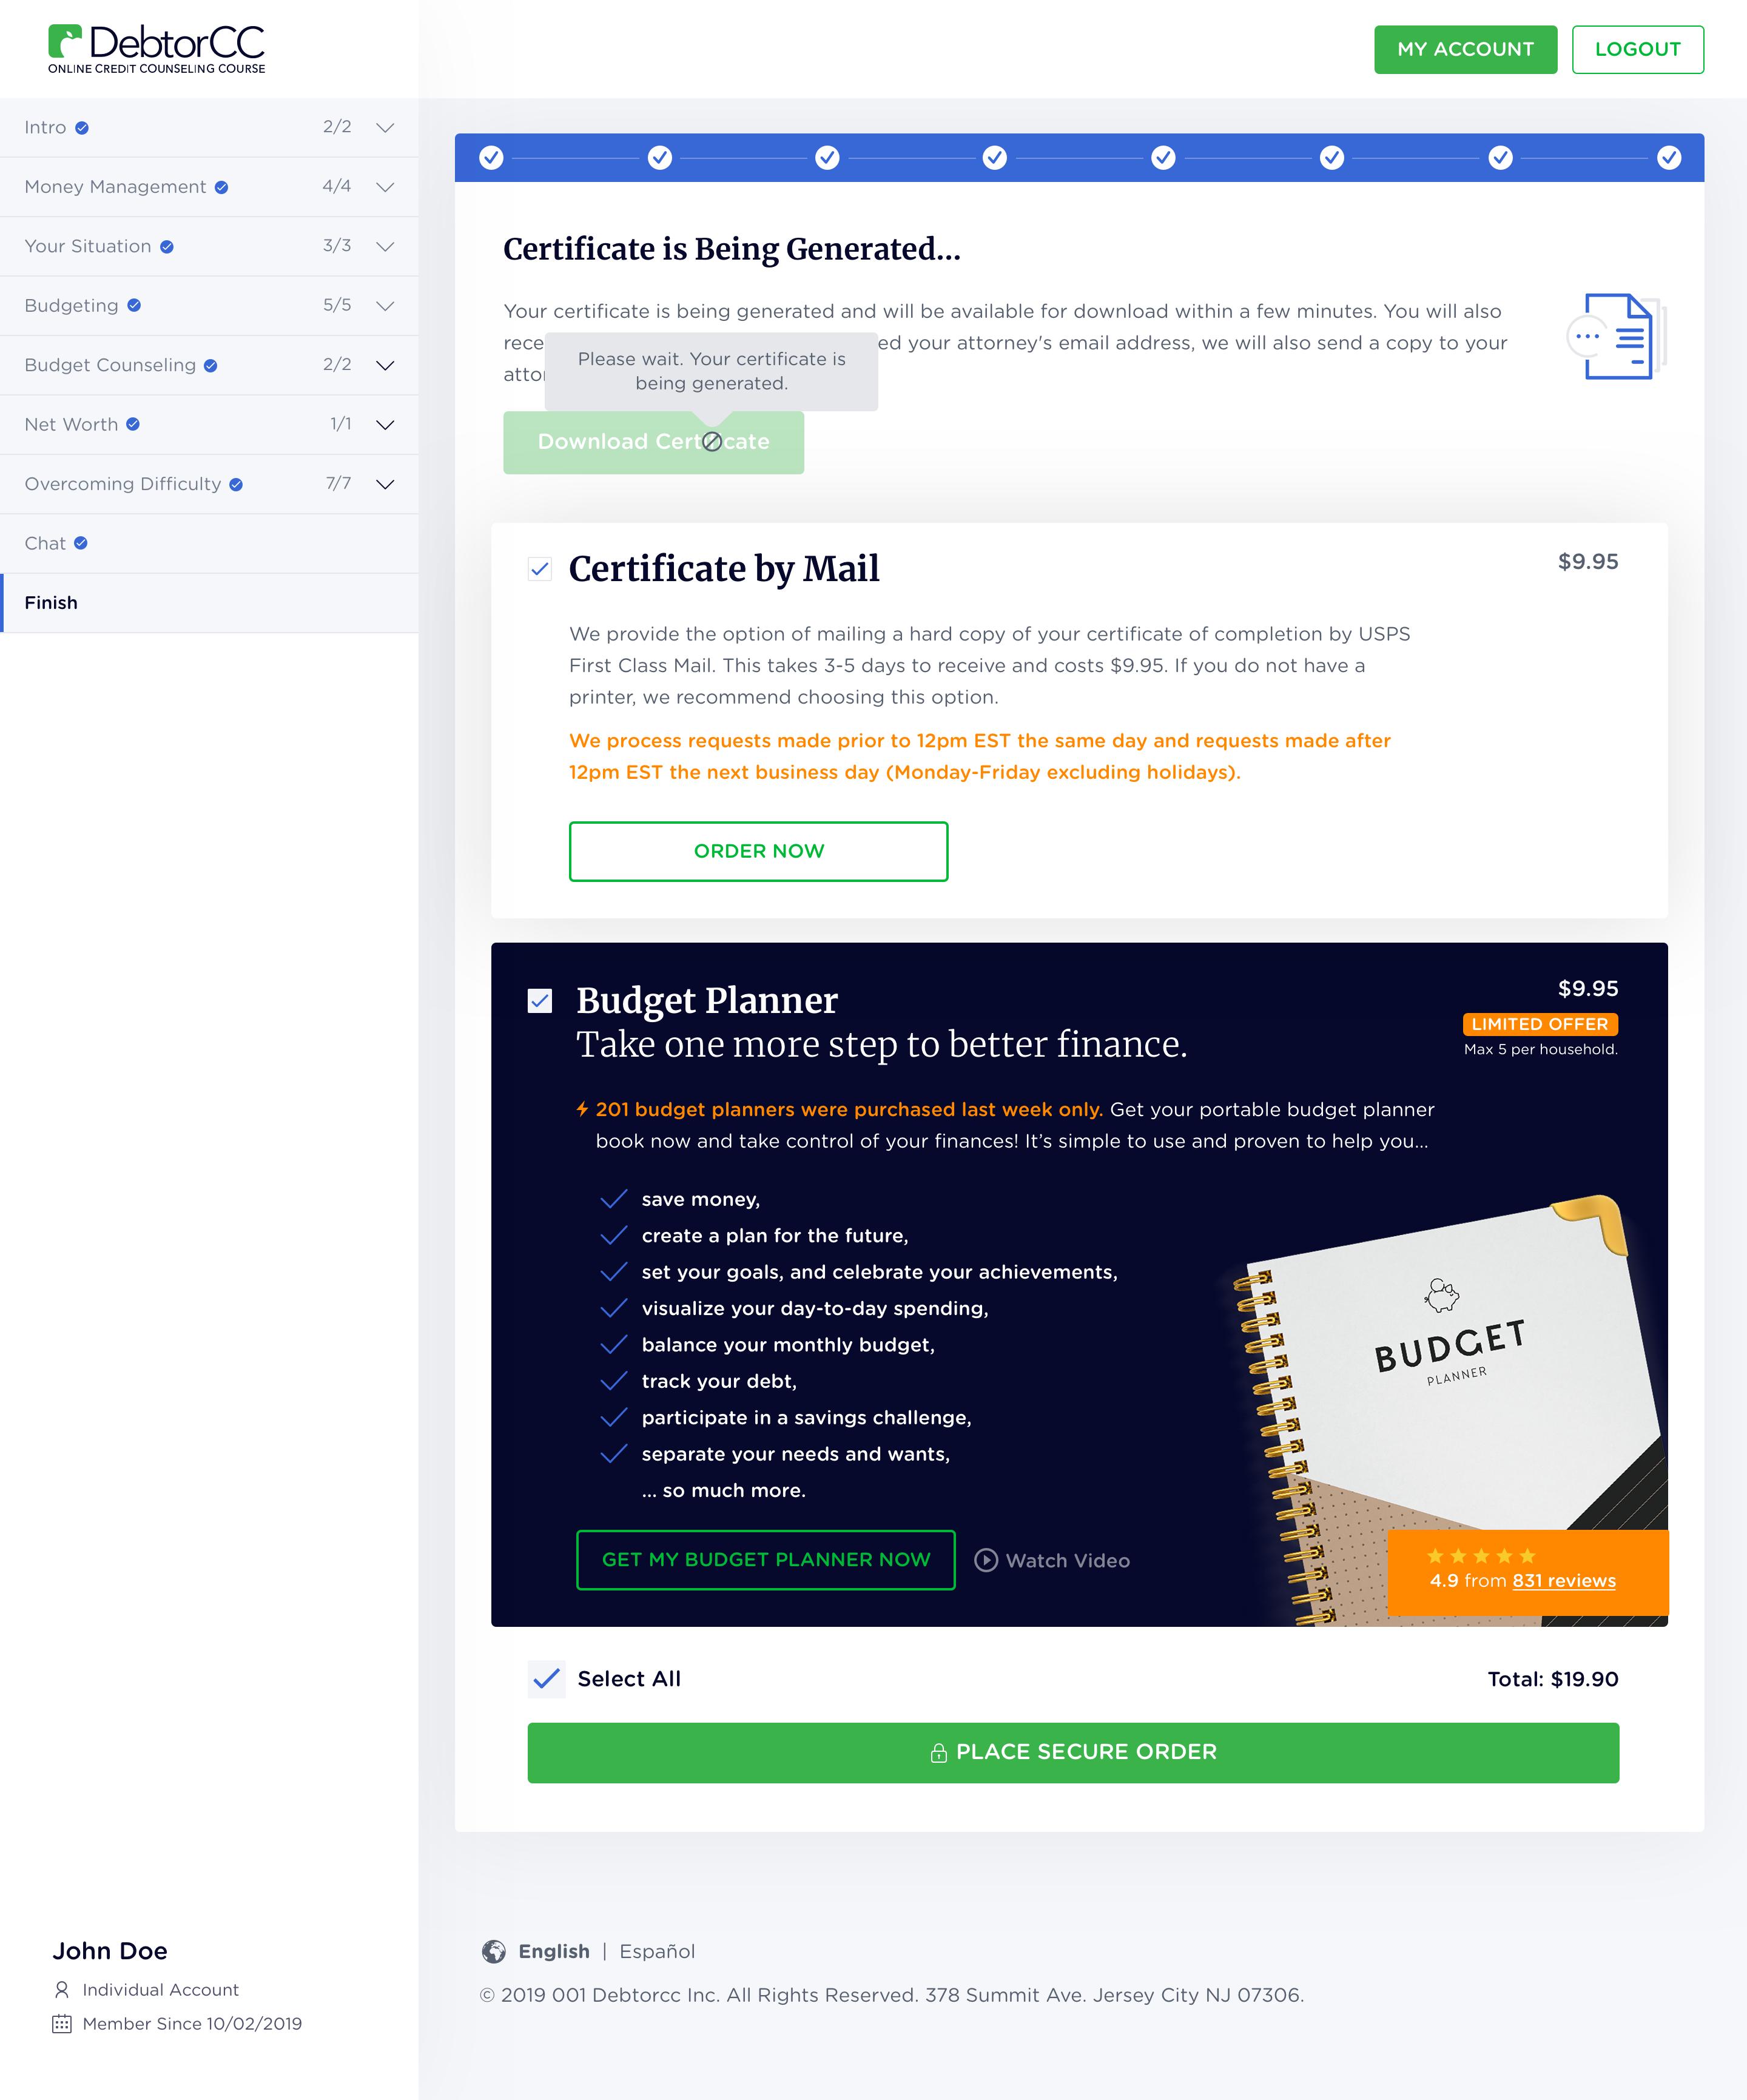 DebtorCC Website Redesign Continuity